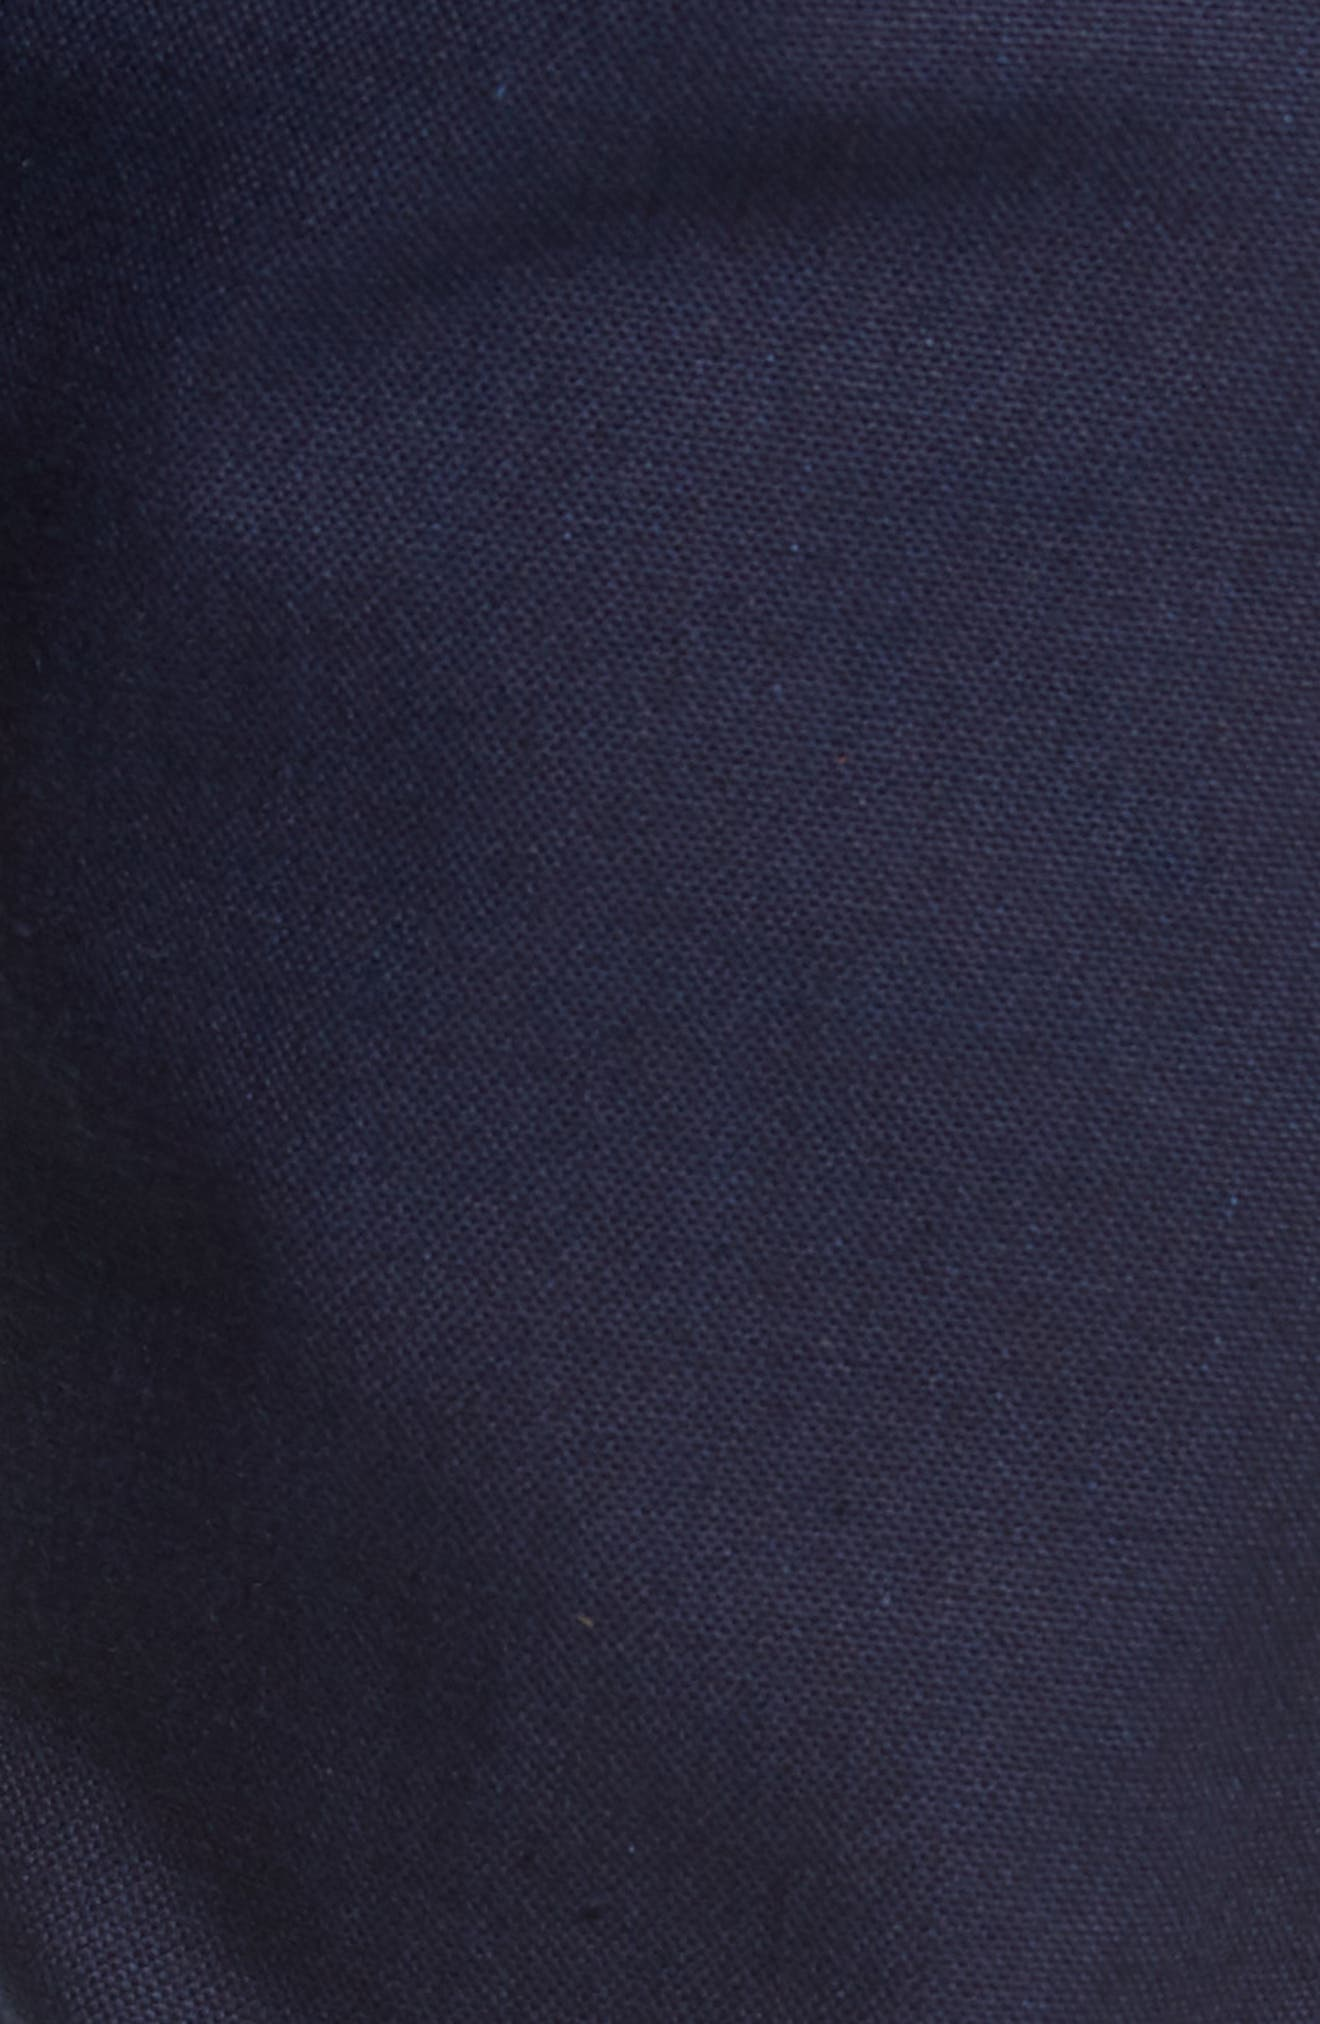 Weird Guy Slim Fit Jeans,                             Alternate thumbnail 5, color,                             INDIGO DUCK CANVAS SELVEDGE